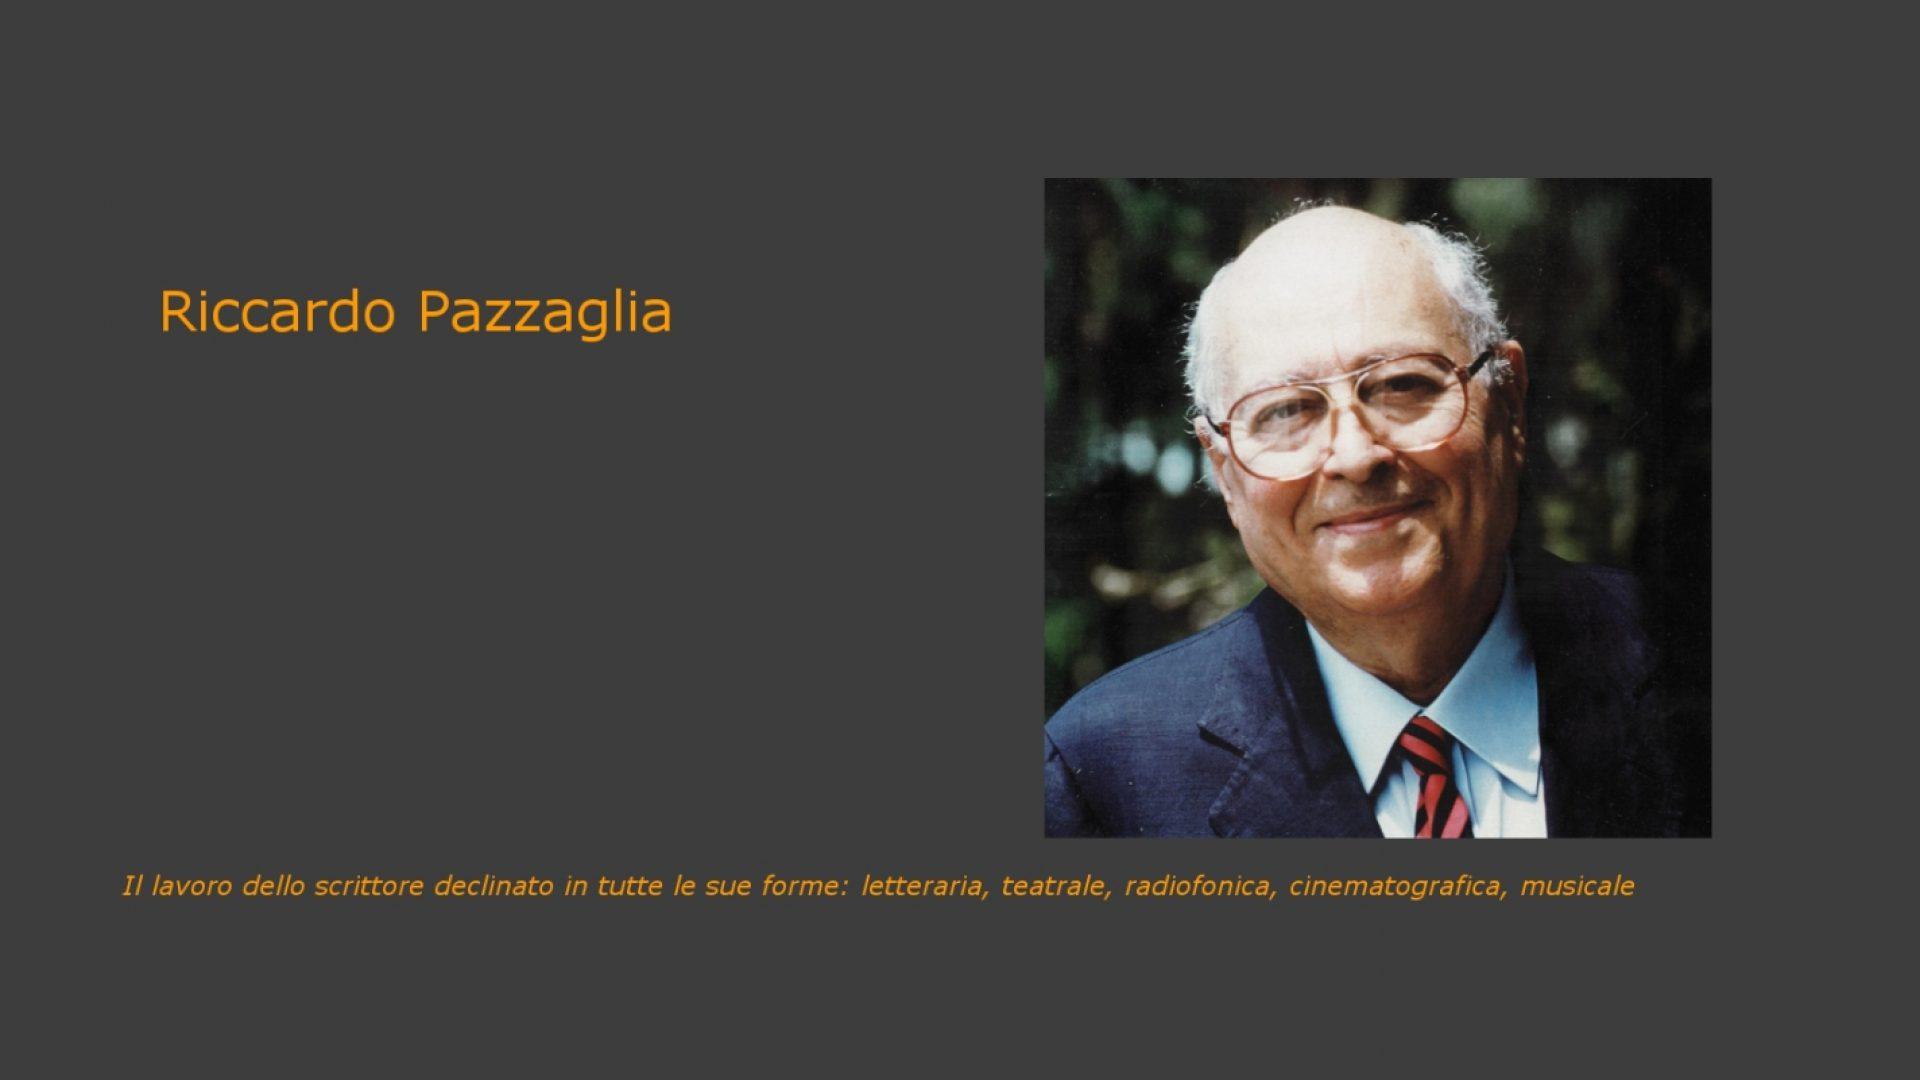 Riccardo Pazzaglia